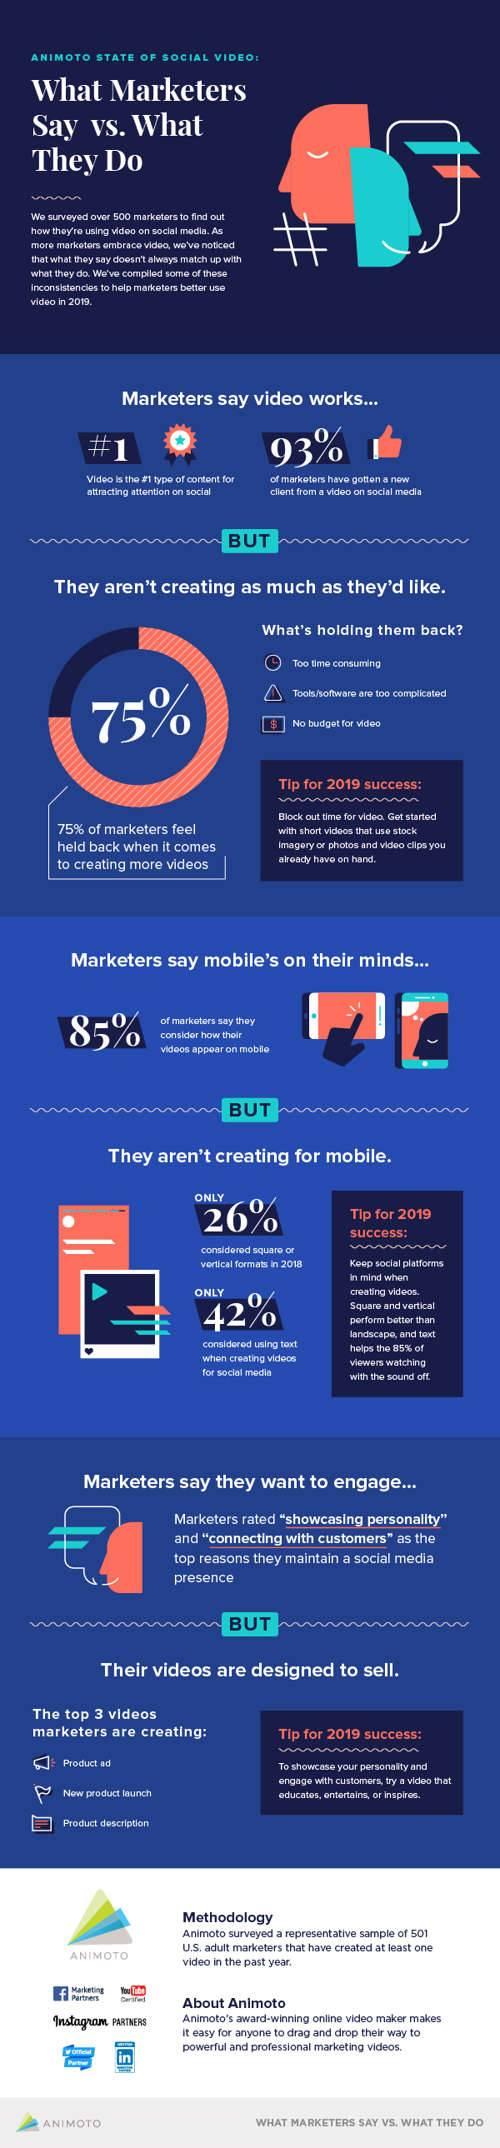 tendencias de video marketing en 2019 infografia